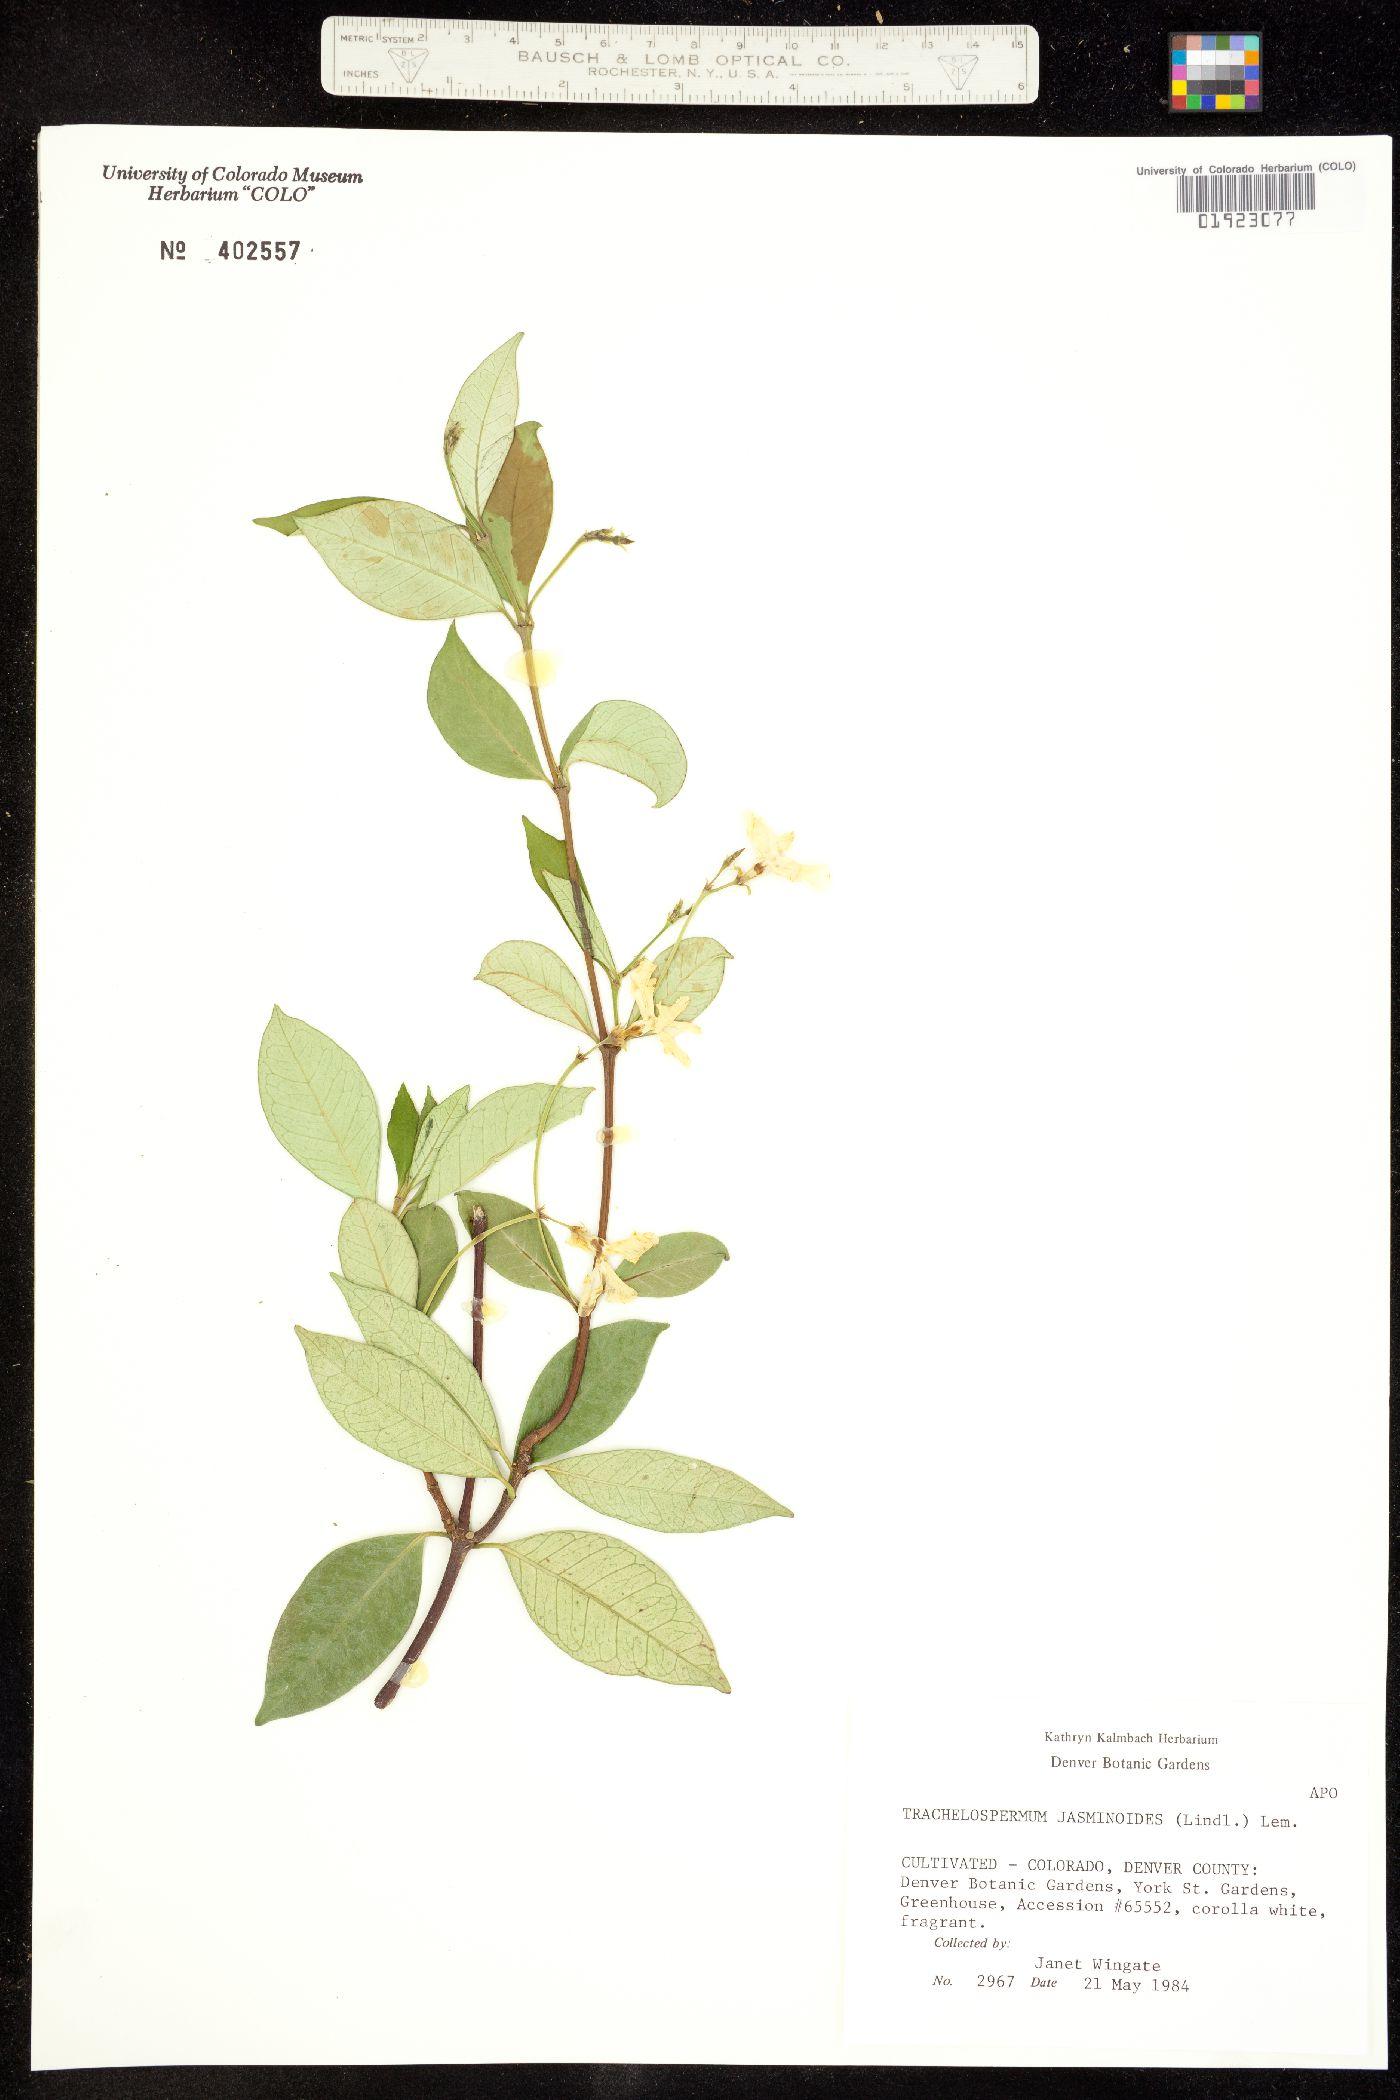 Trachelospermum jasminoides image